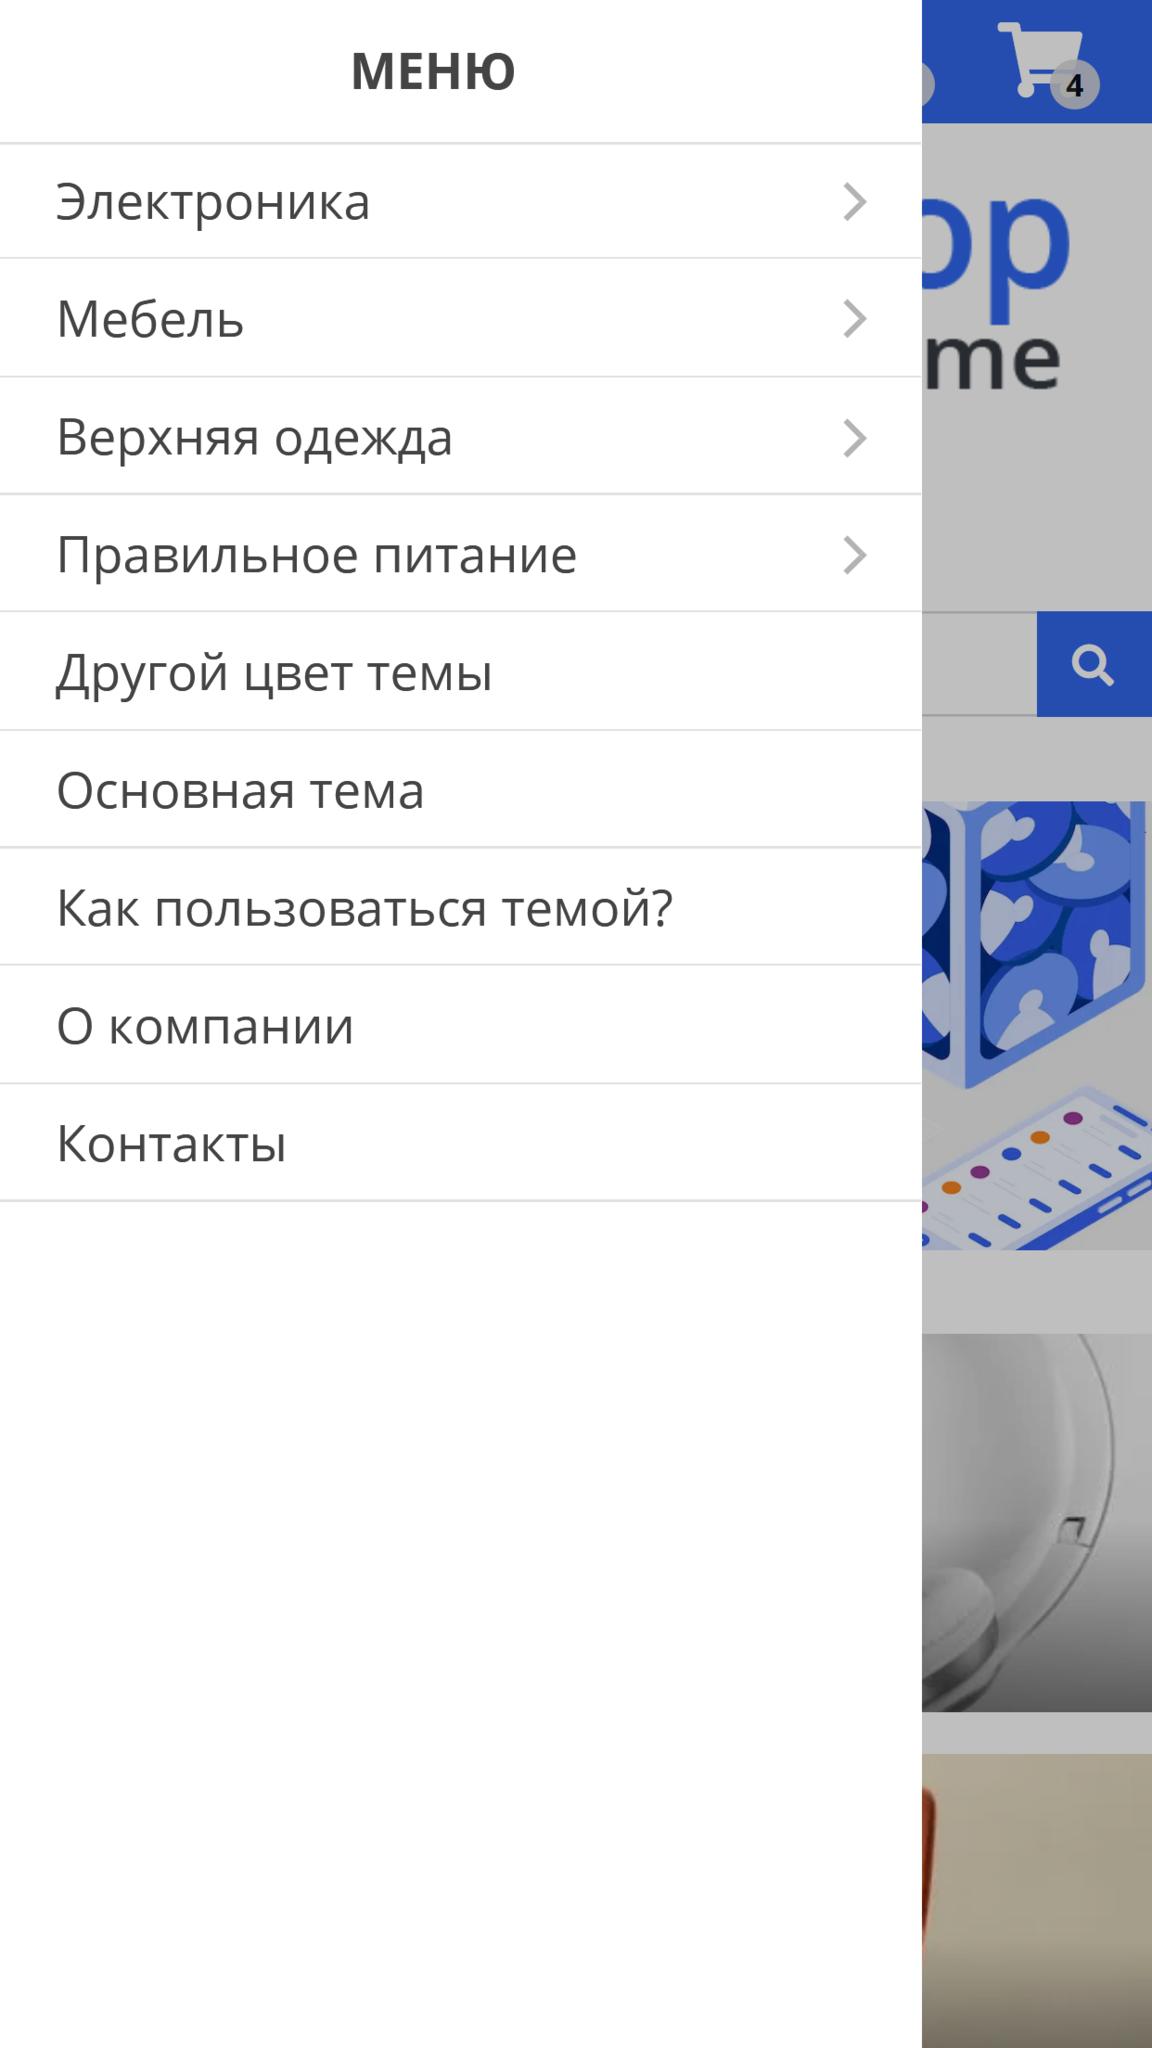 Шаблон интернет магазина - E-comm